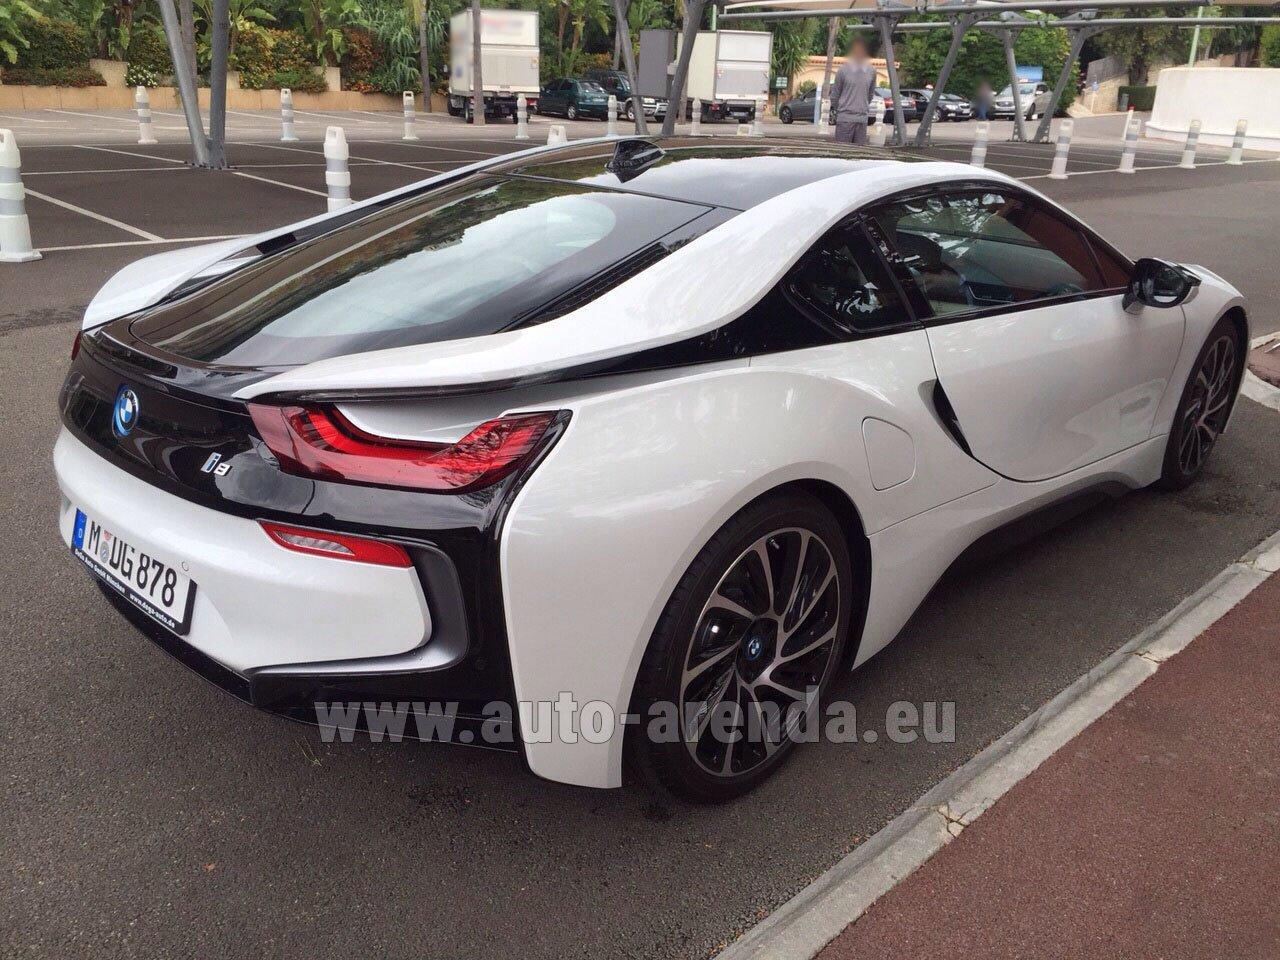 Аренда автомобиля БМВ i8 Купе Pure Impulse в Берлине